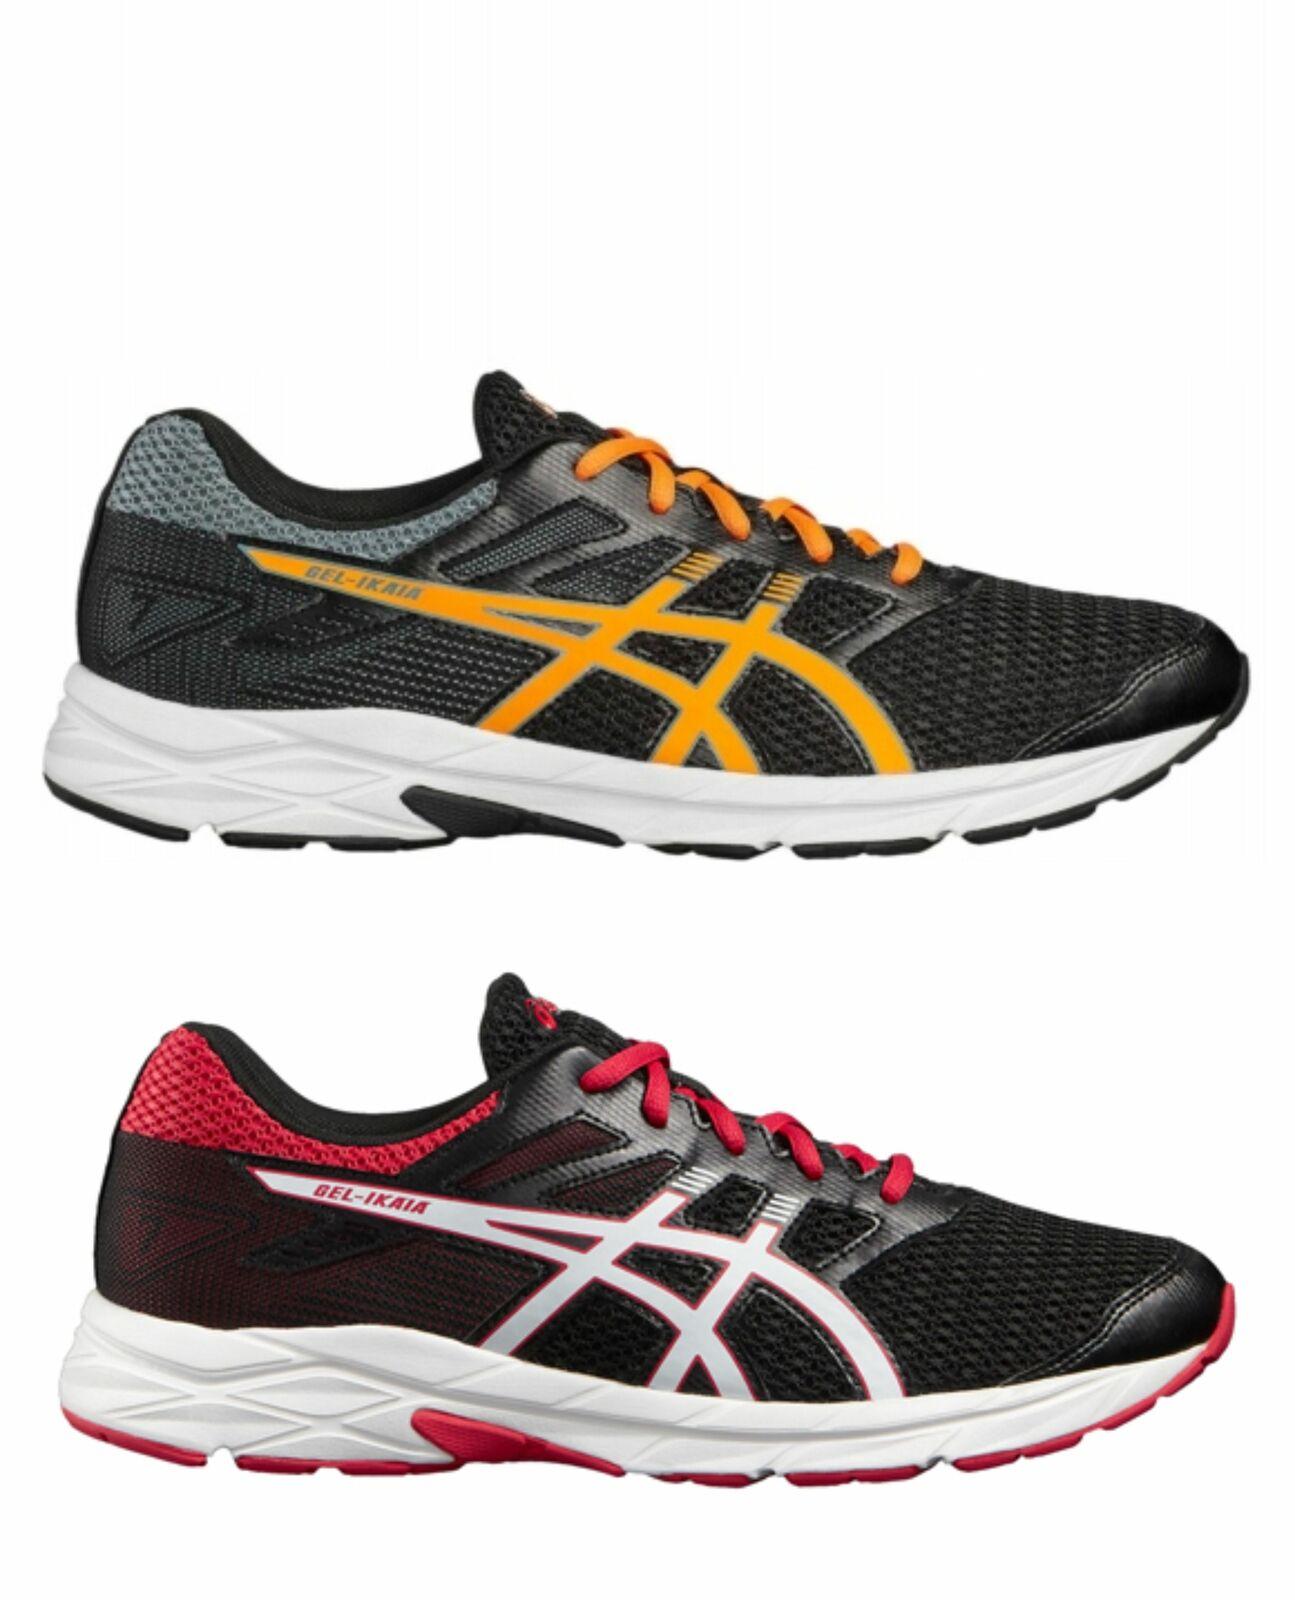 Asics Running shoes Mens Gel Ikaia 7 Neutral Gait Cushioning